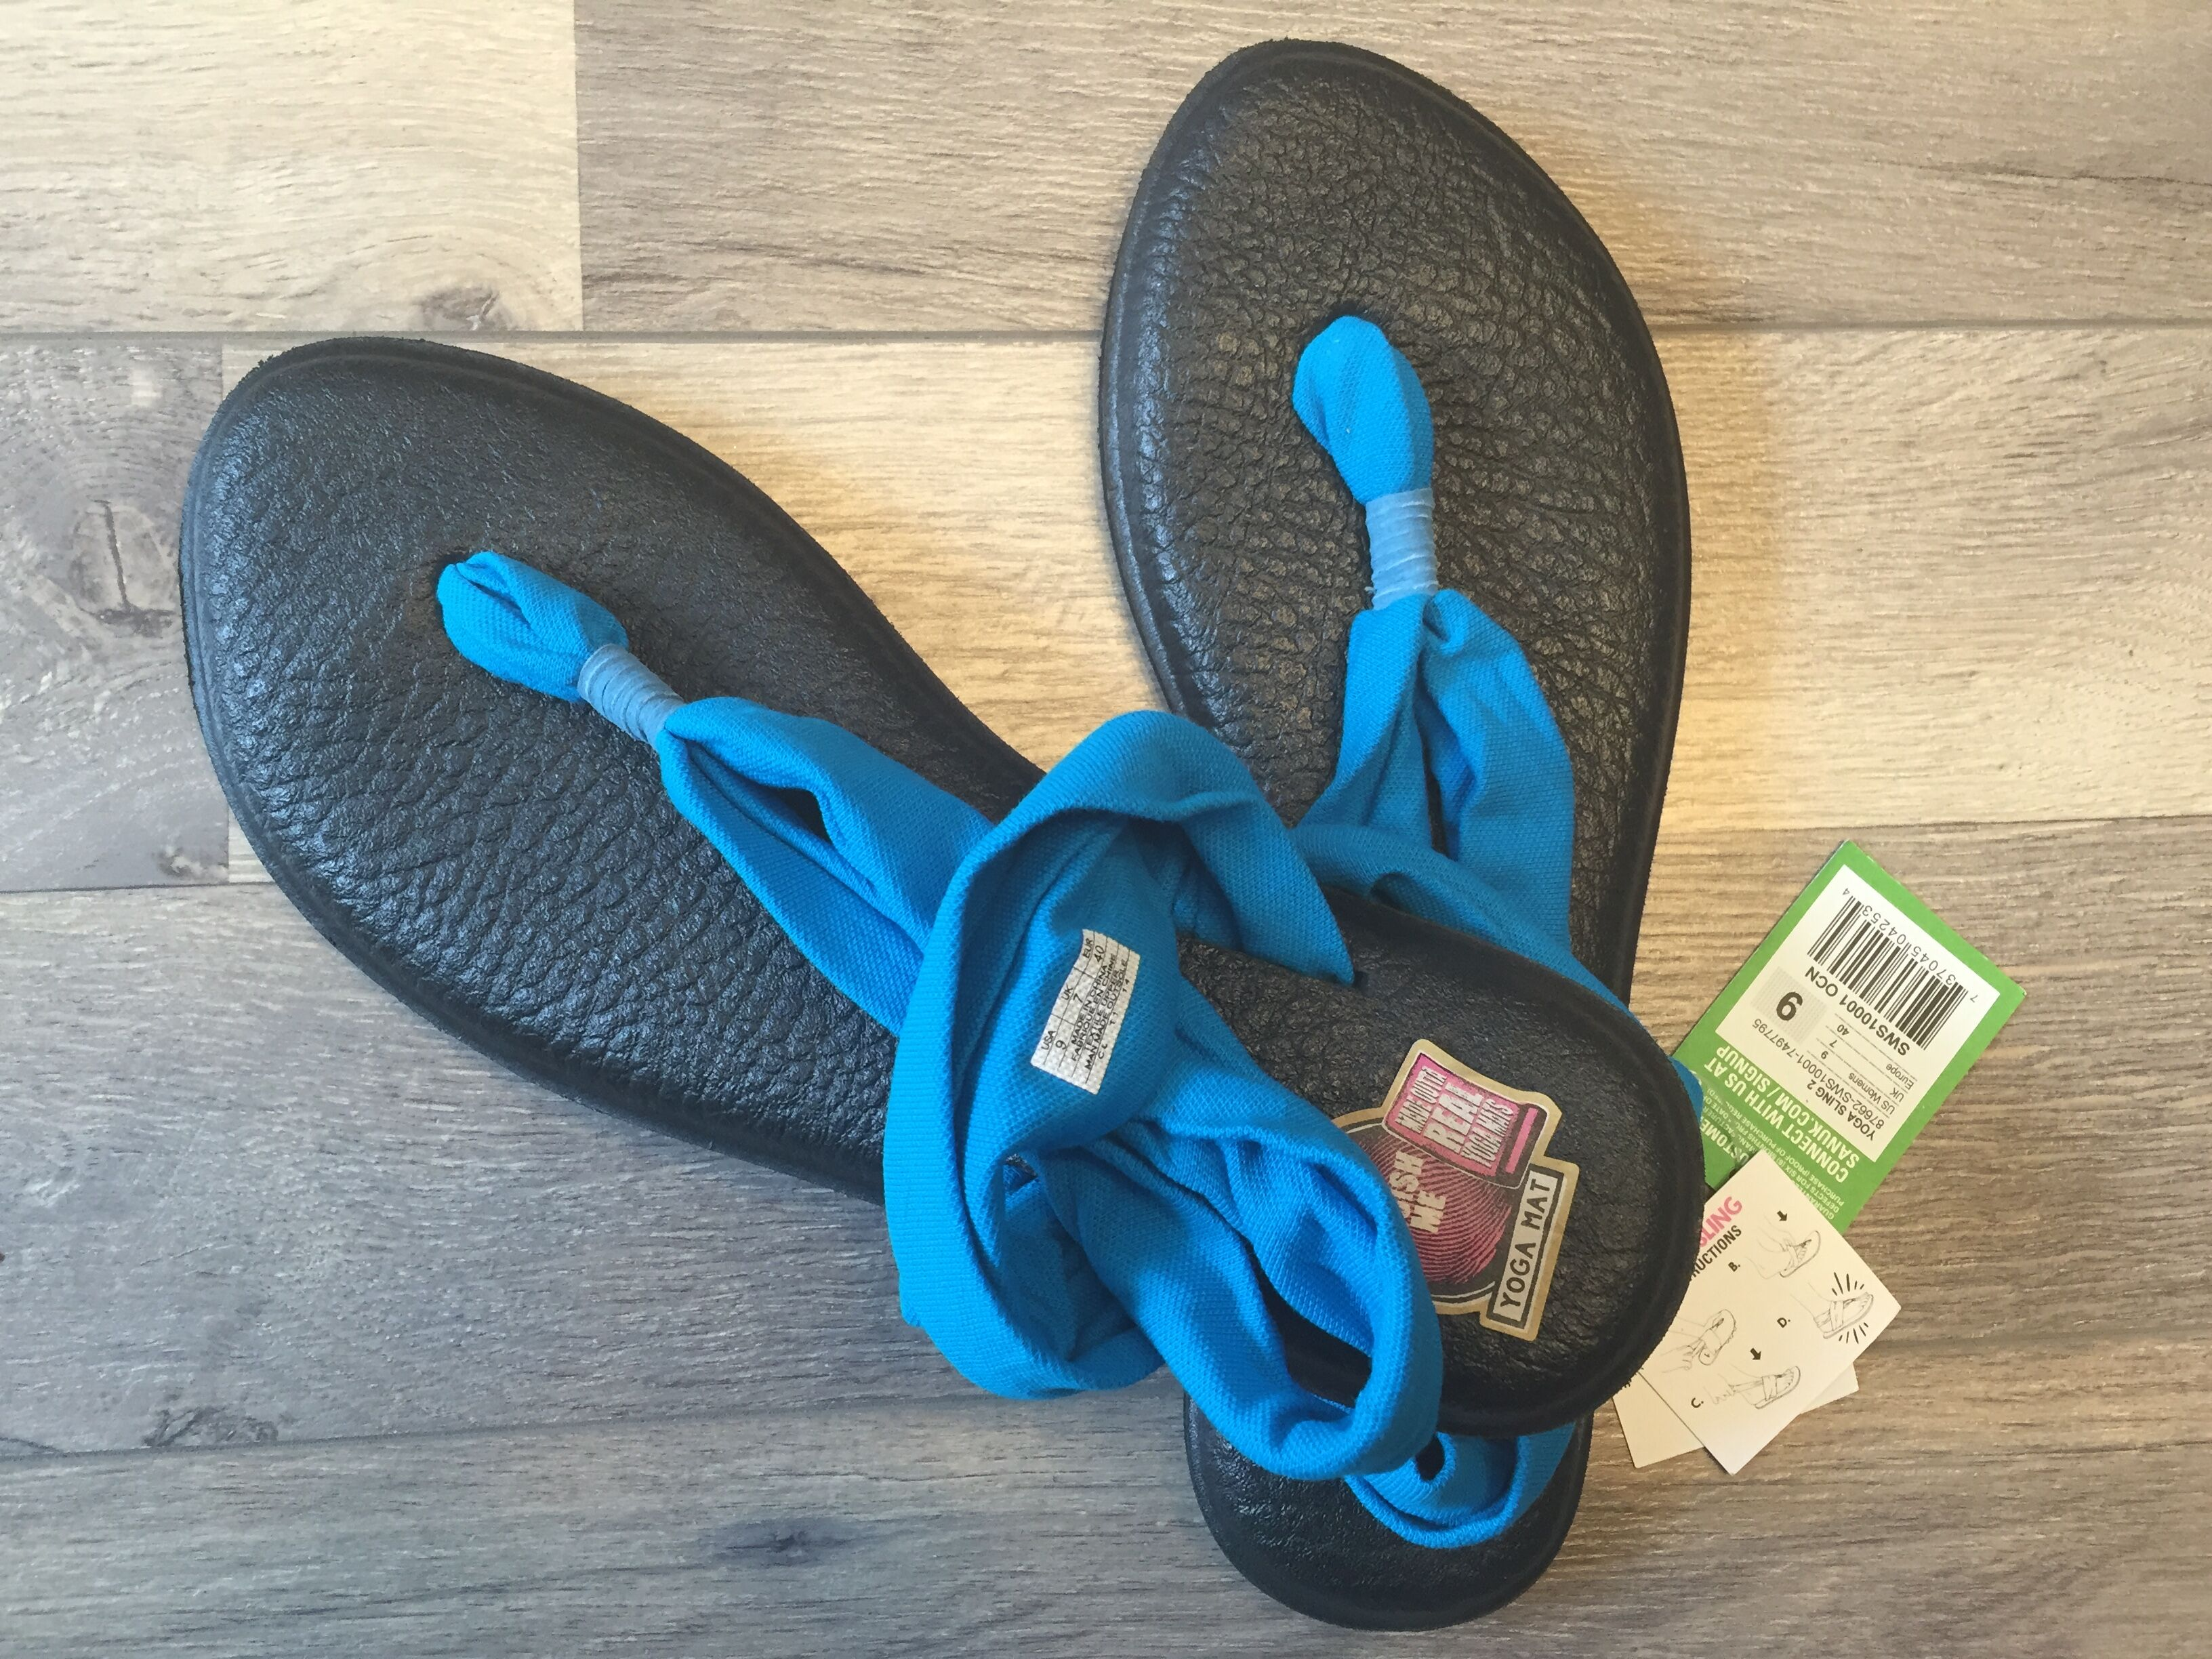 Sanuk Yoga凉鞋18刀到手